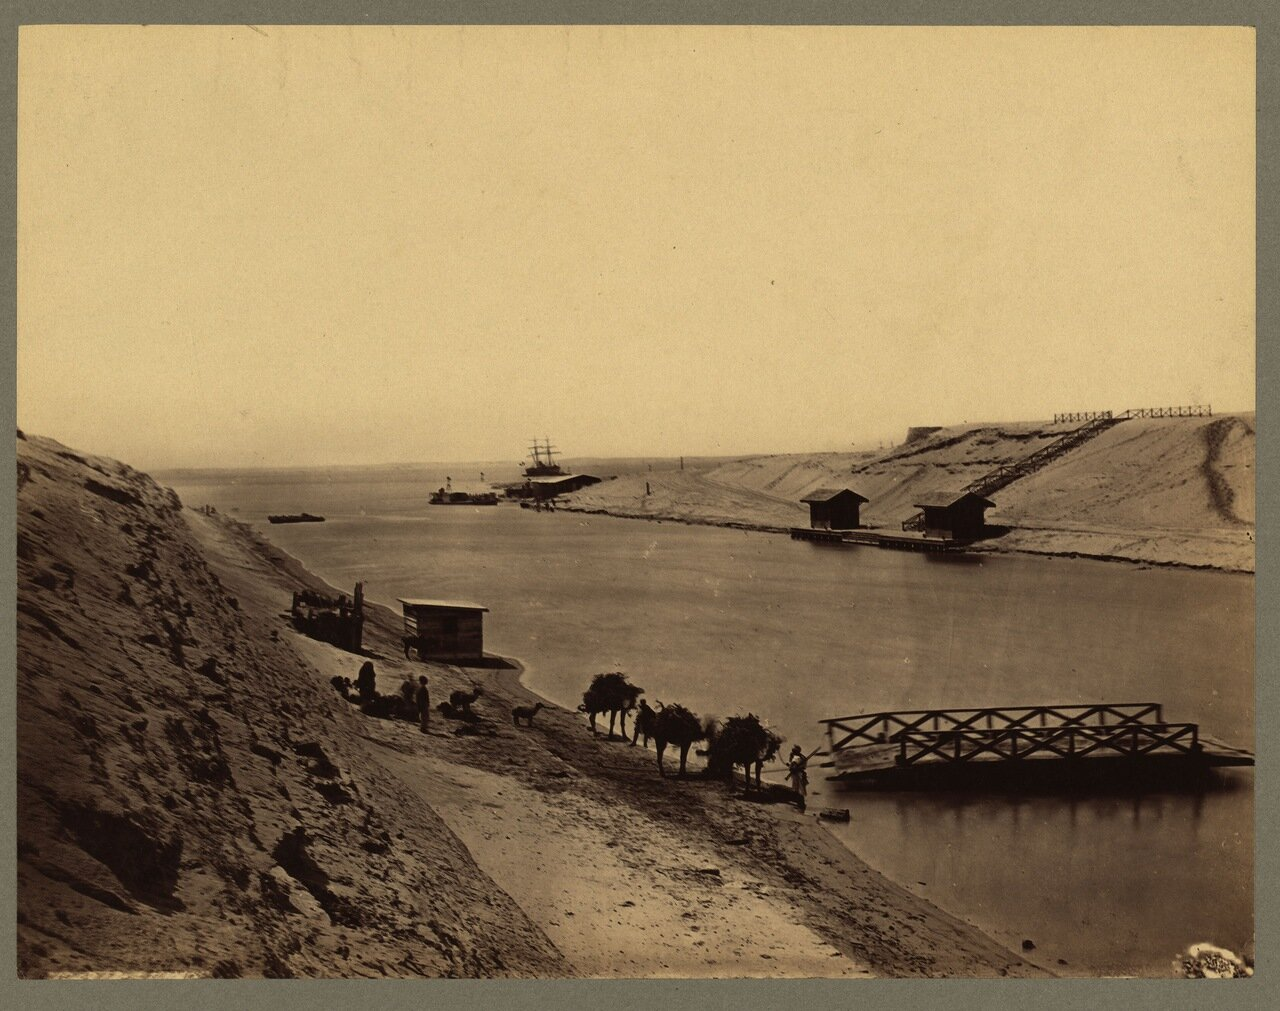 Суэцкий канал. Озеро Тимсах